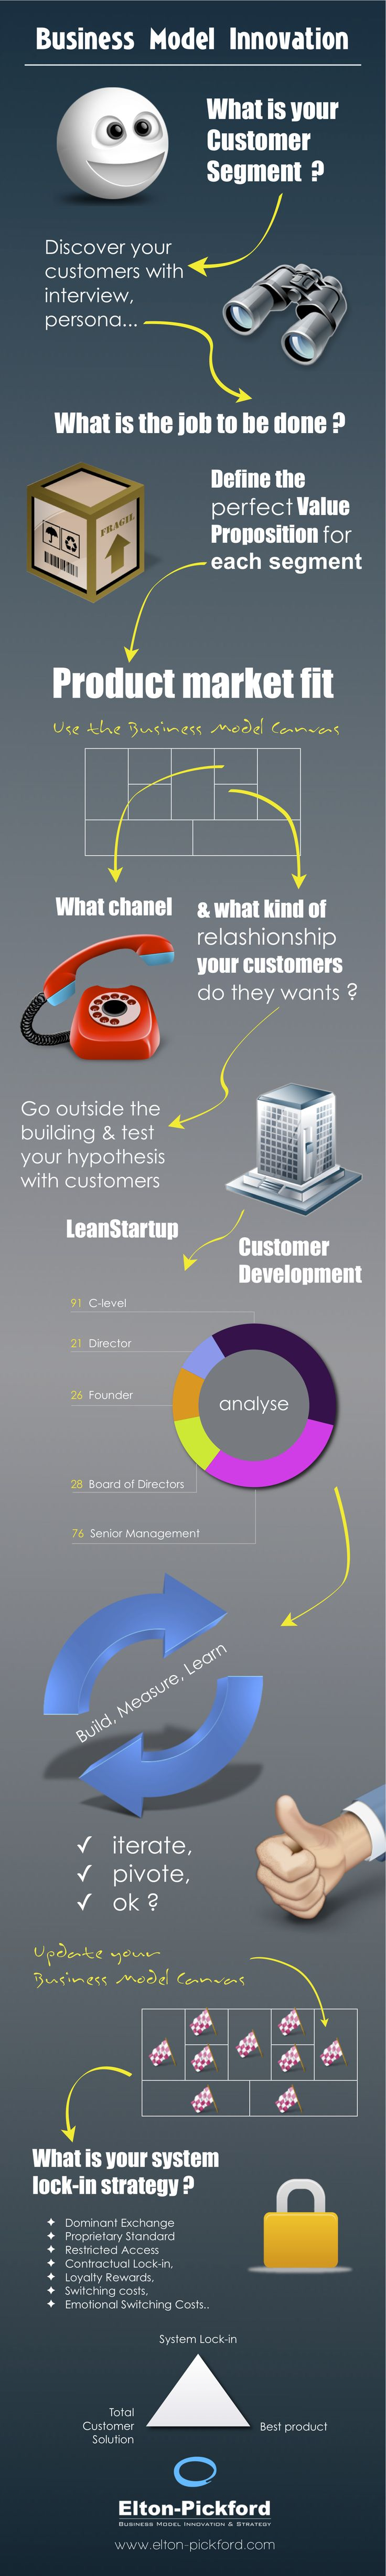 Elton-Pickford - Business Model Innovation Infographics  www.elton-pickford.com